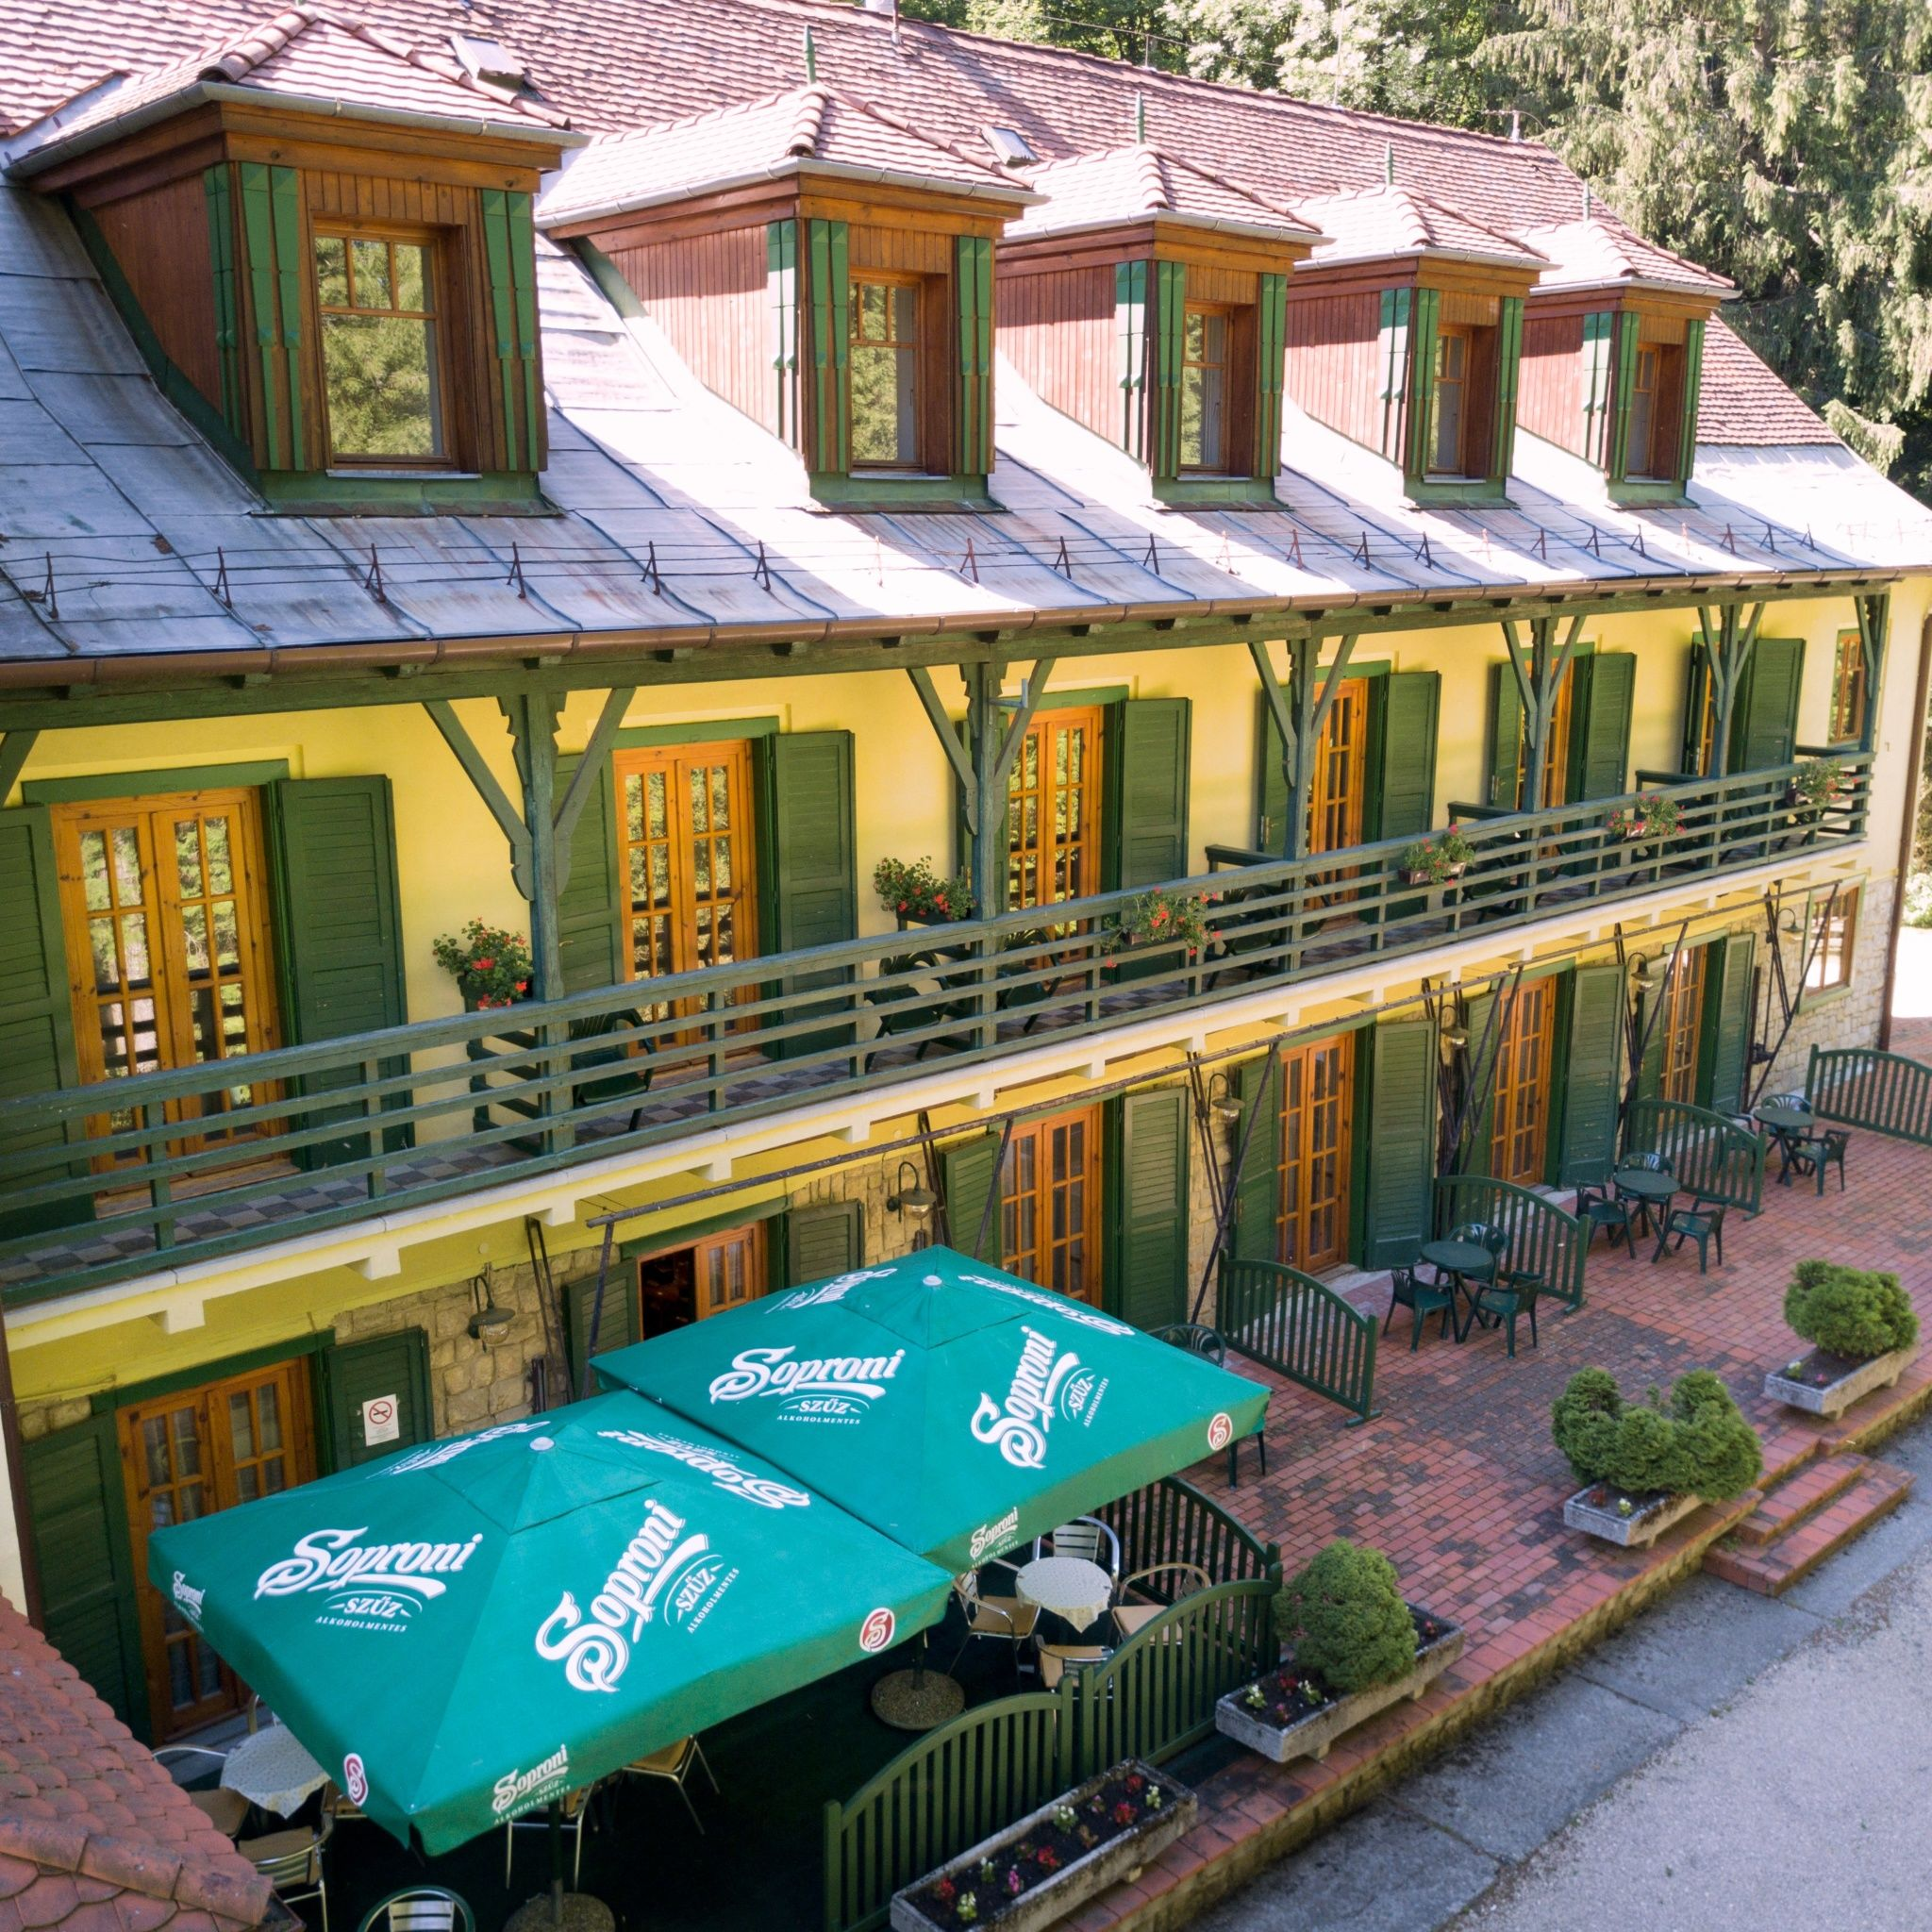 Bakony Hotel Bakonybél - Bakony Hotel